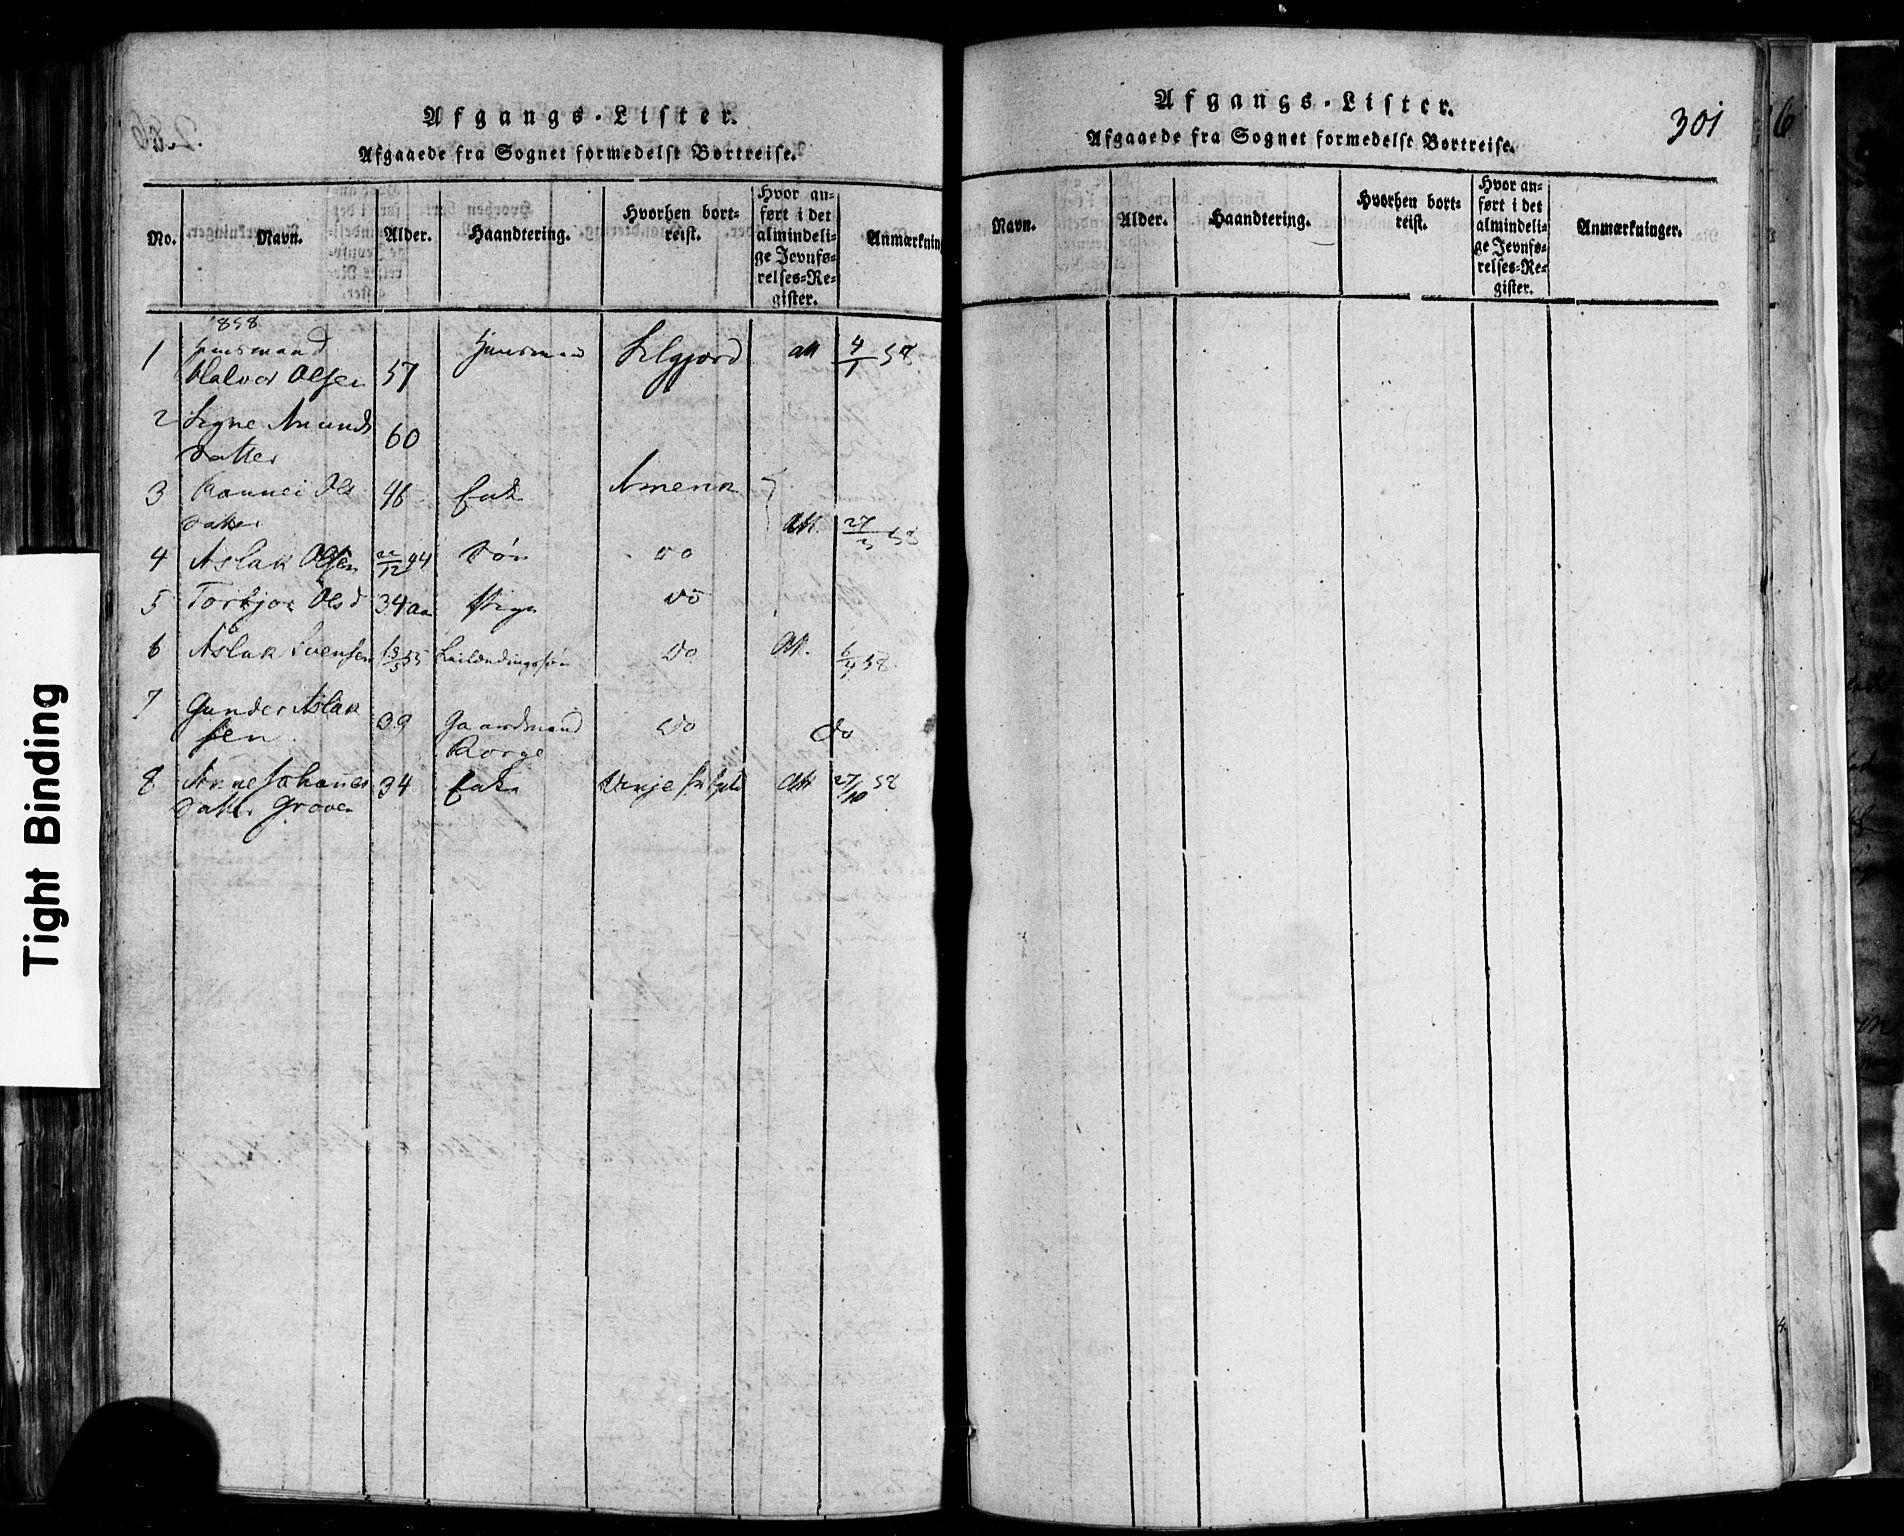 SAKO, Rauland kirkebøker, F/Fa/L0002: Ministerialbok nr. 2, 1815-1860, s. 301